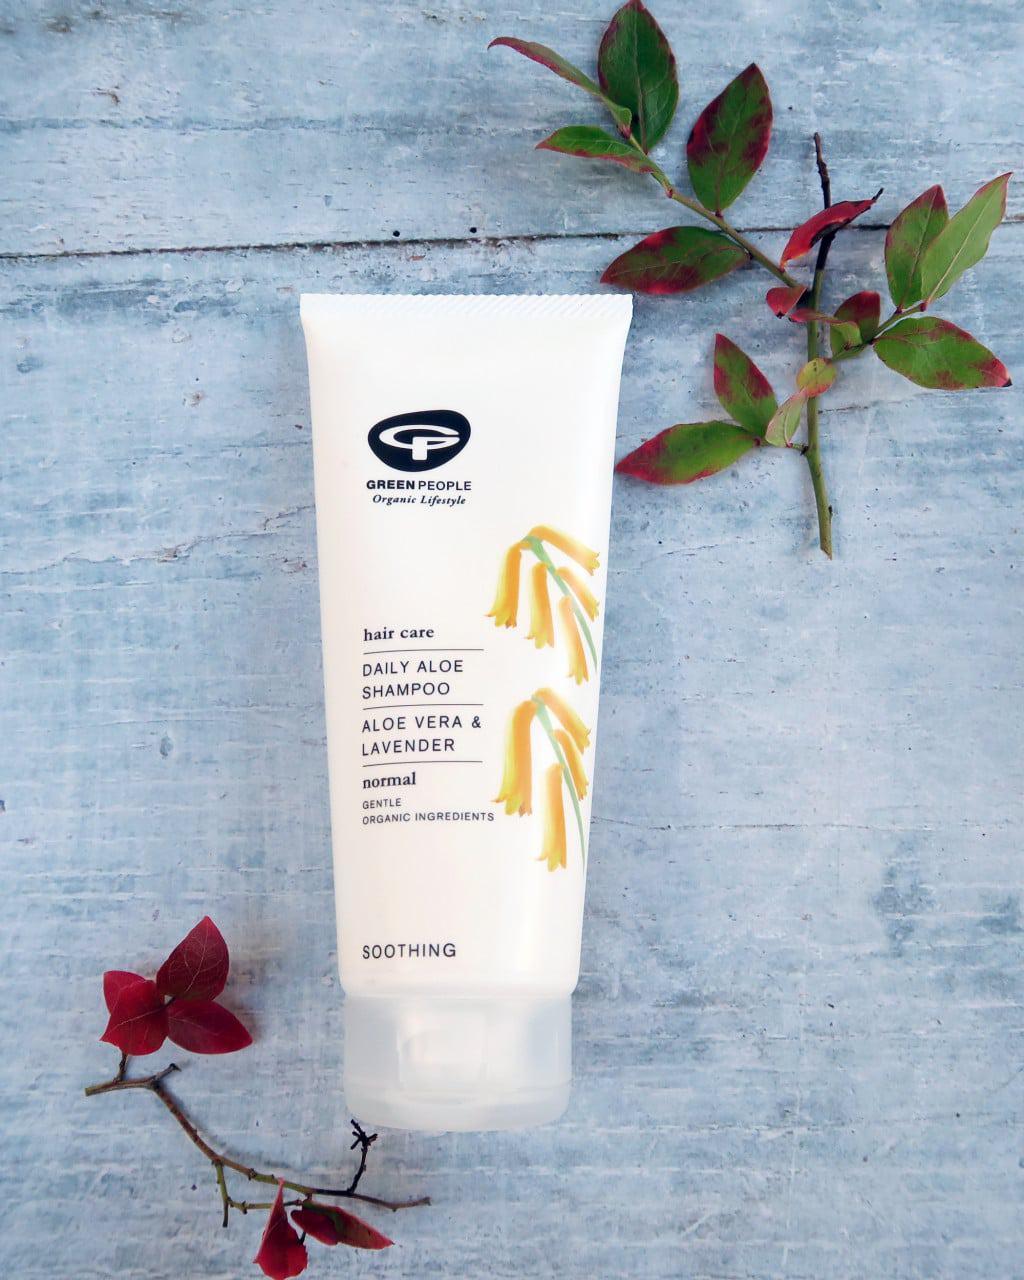 Seasonal skincare using Green People products | Daily Aloe Shampoo without SLS